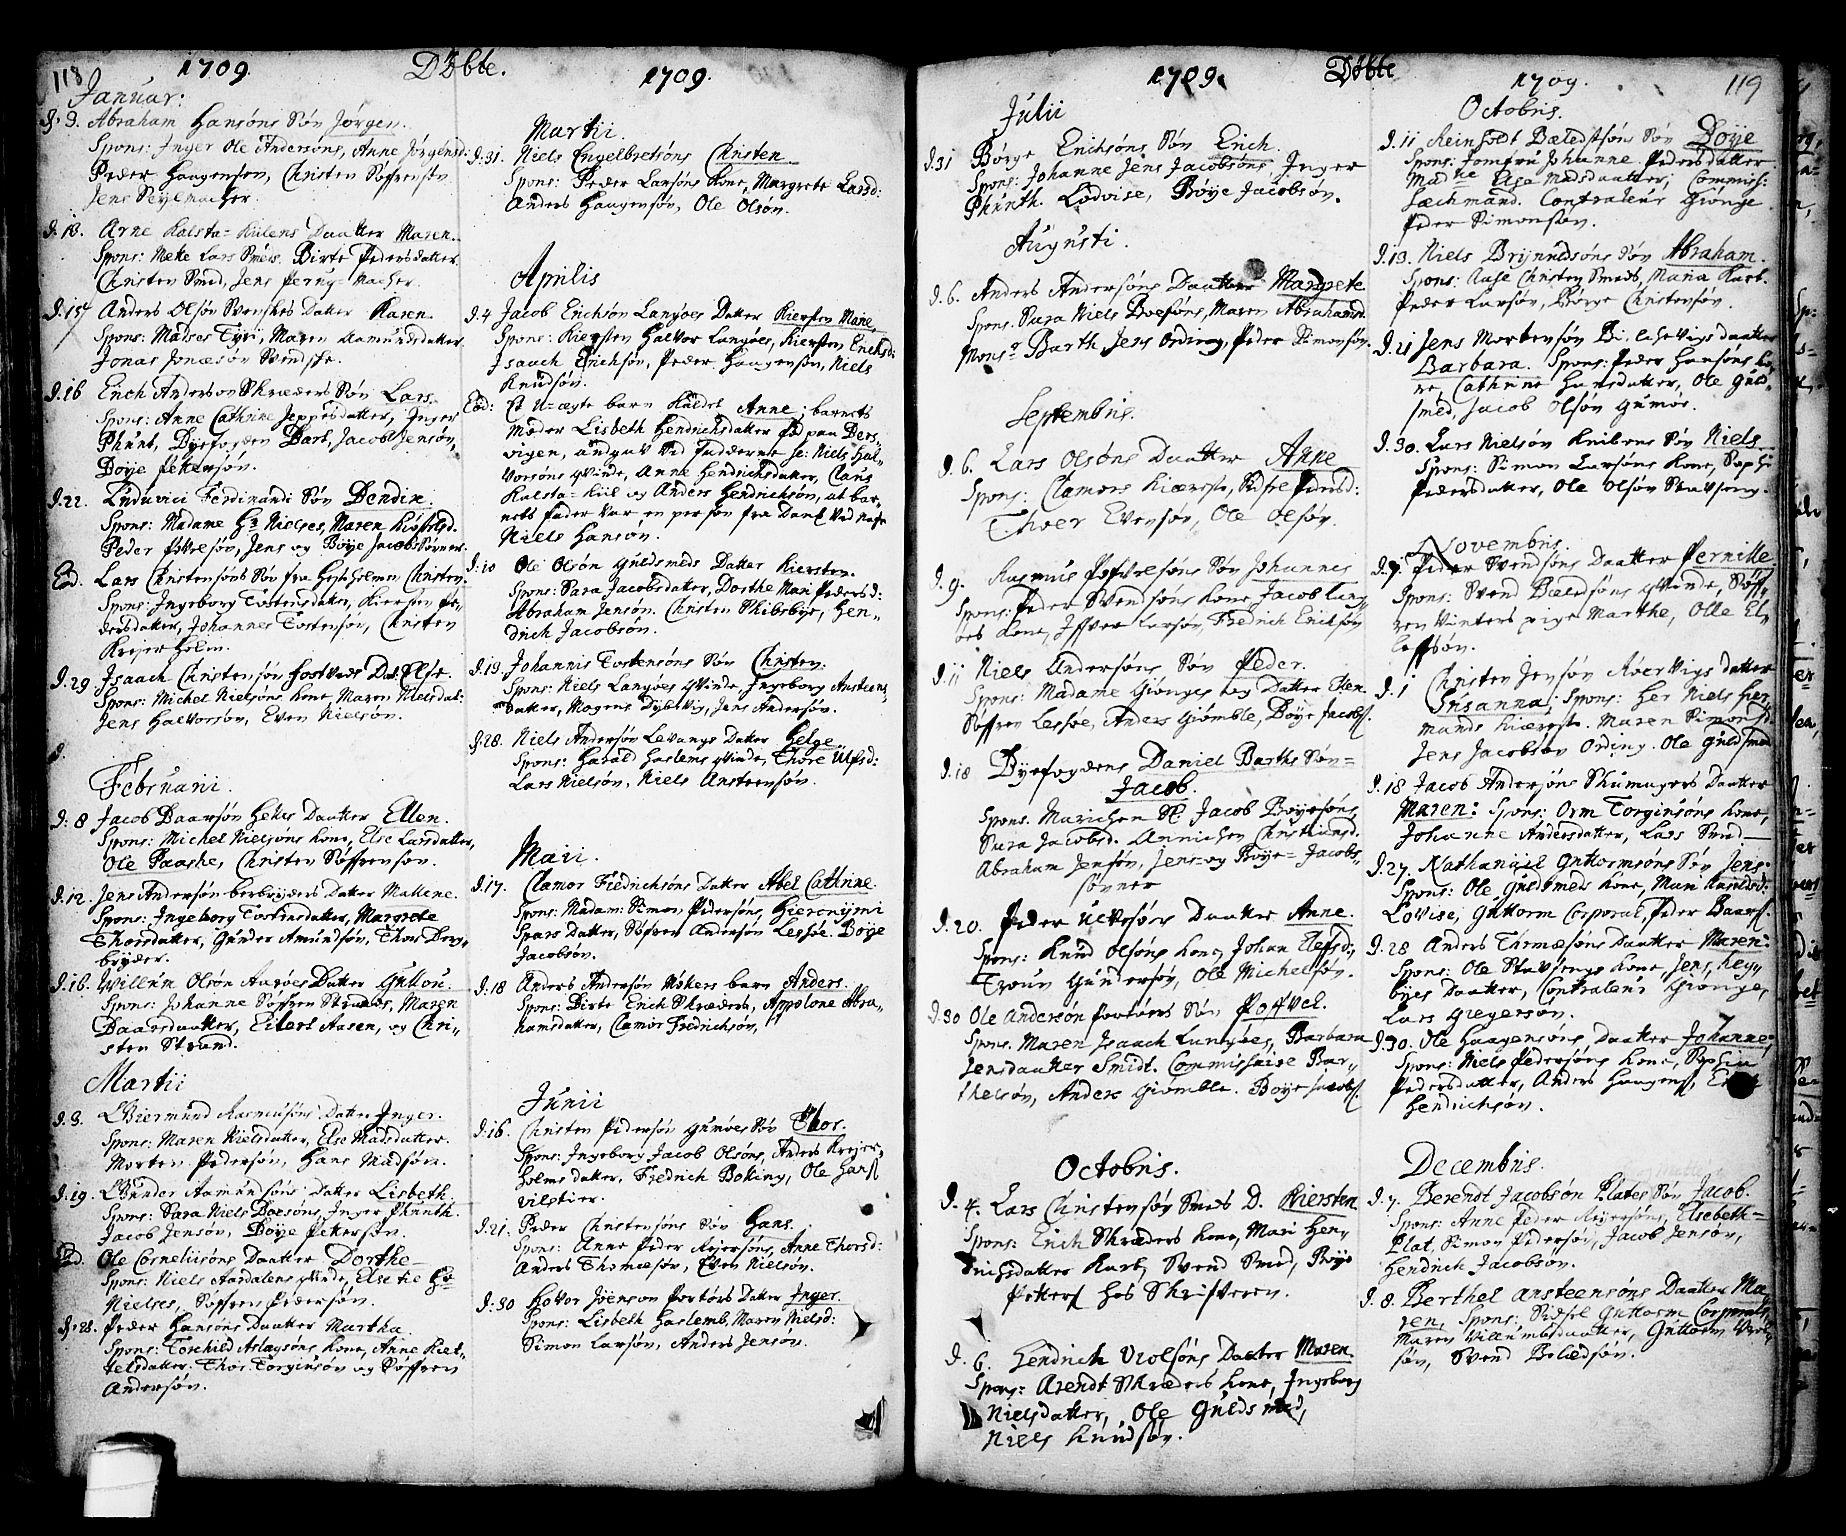 SAKO, Kragerø kirkebøker, F/Fa/L0001: Ministerialbok nr. 1, 1702-1766, s. 118-119